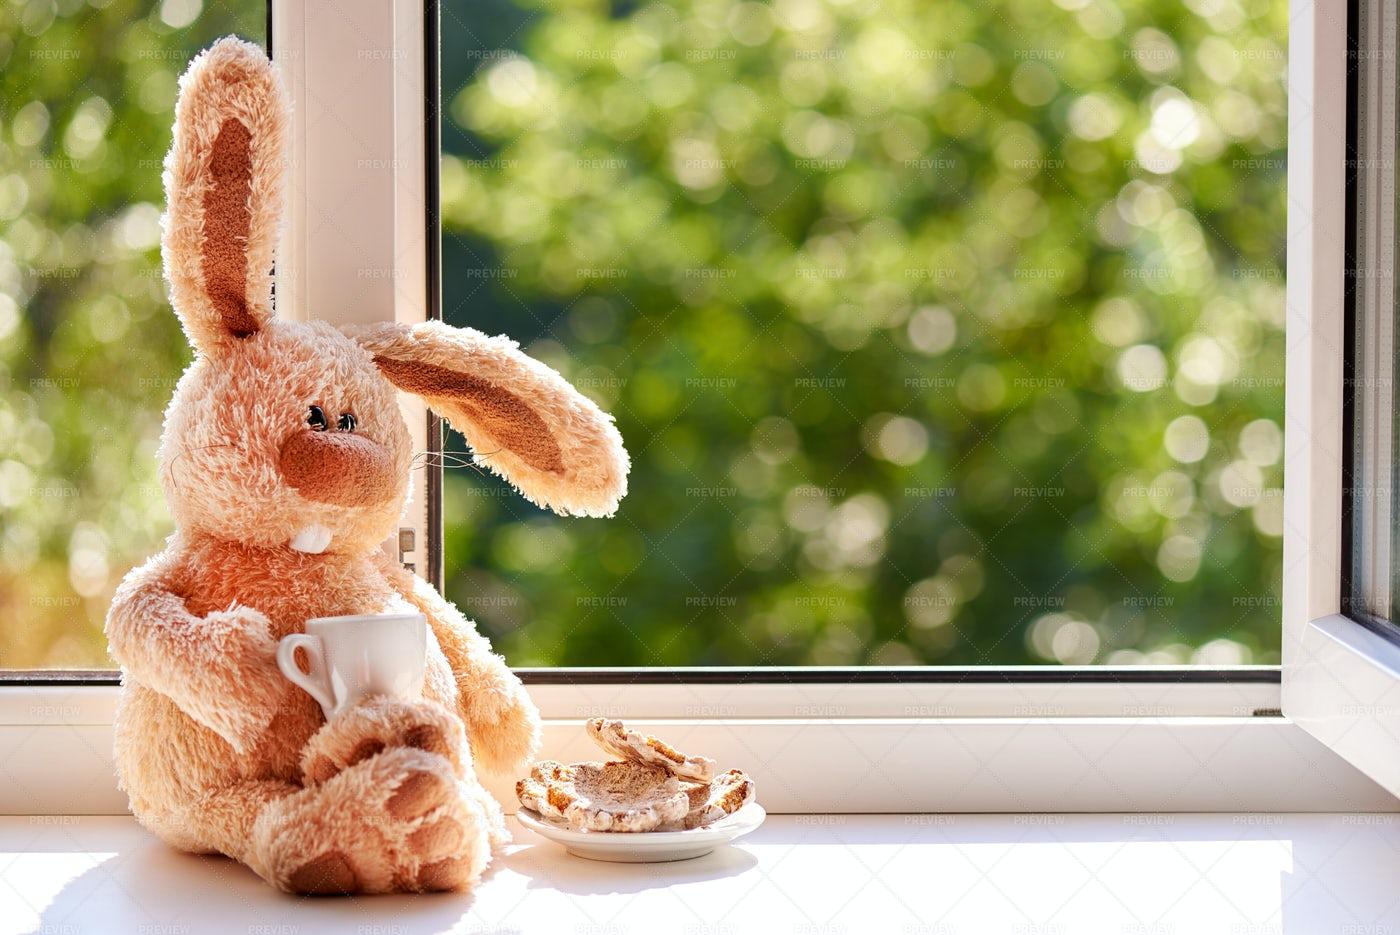 Rabbit Next To Open Window.: Stock Photos